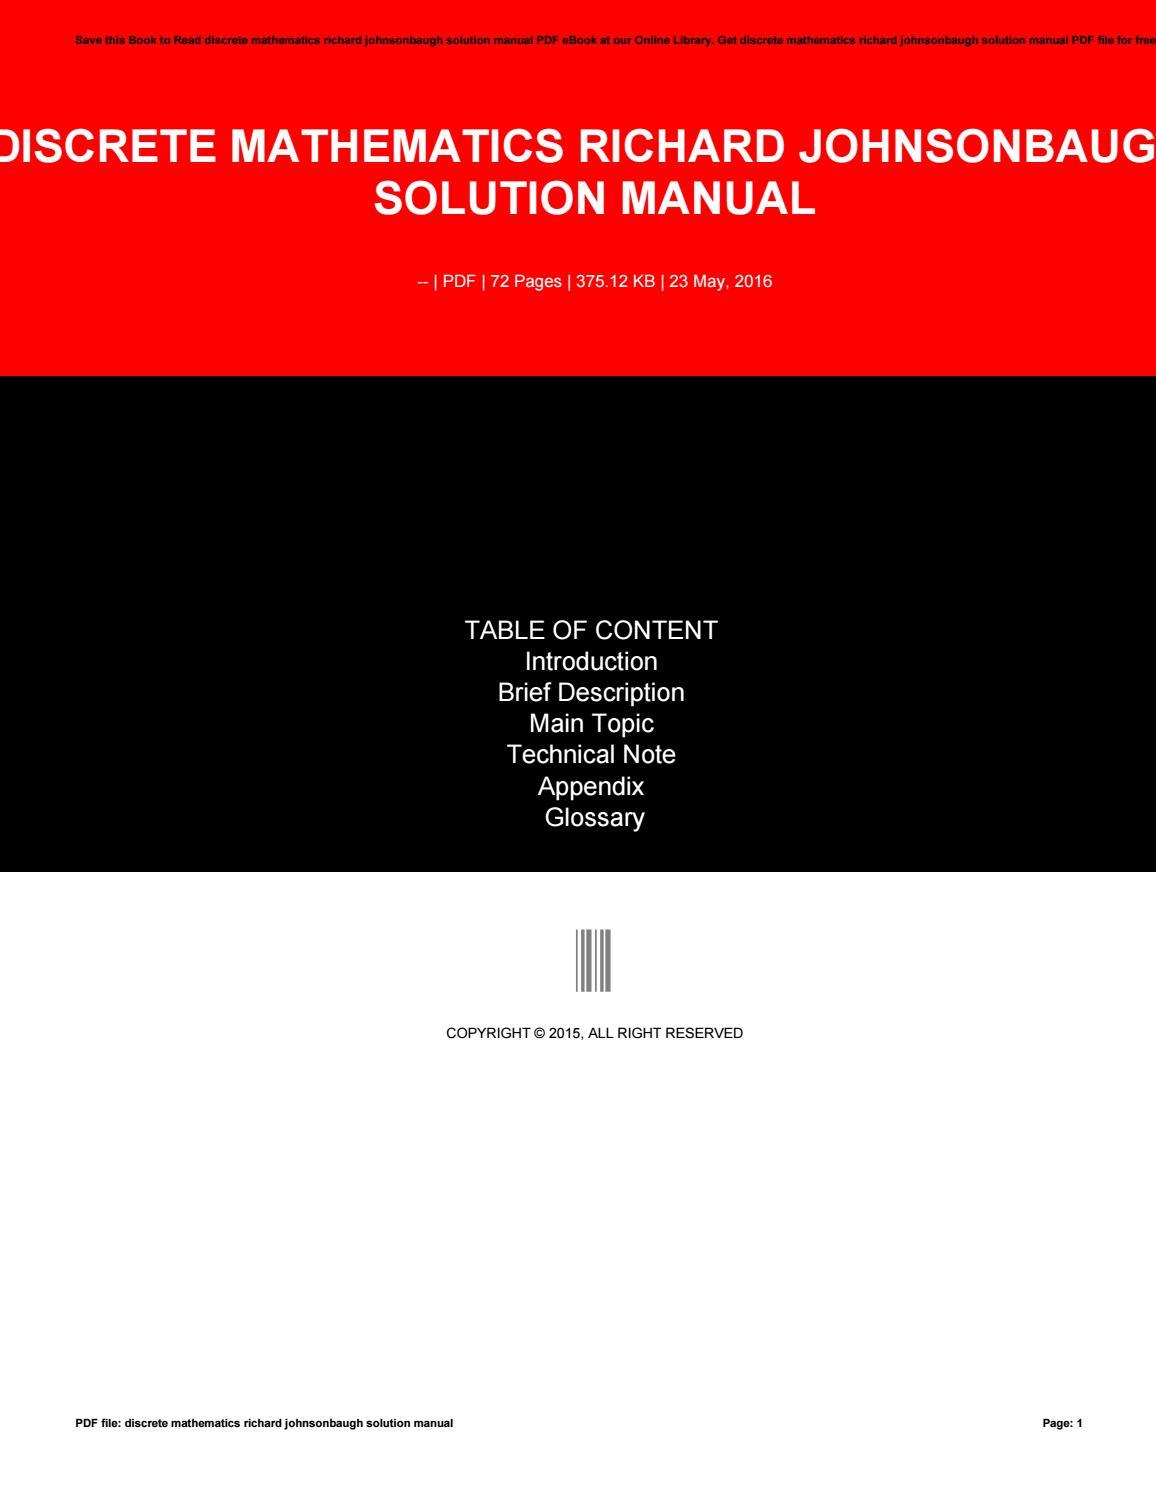 Discrete mathematics richard johnsonbaugh solution manual by mdhc34 - issuu